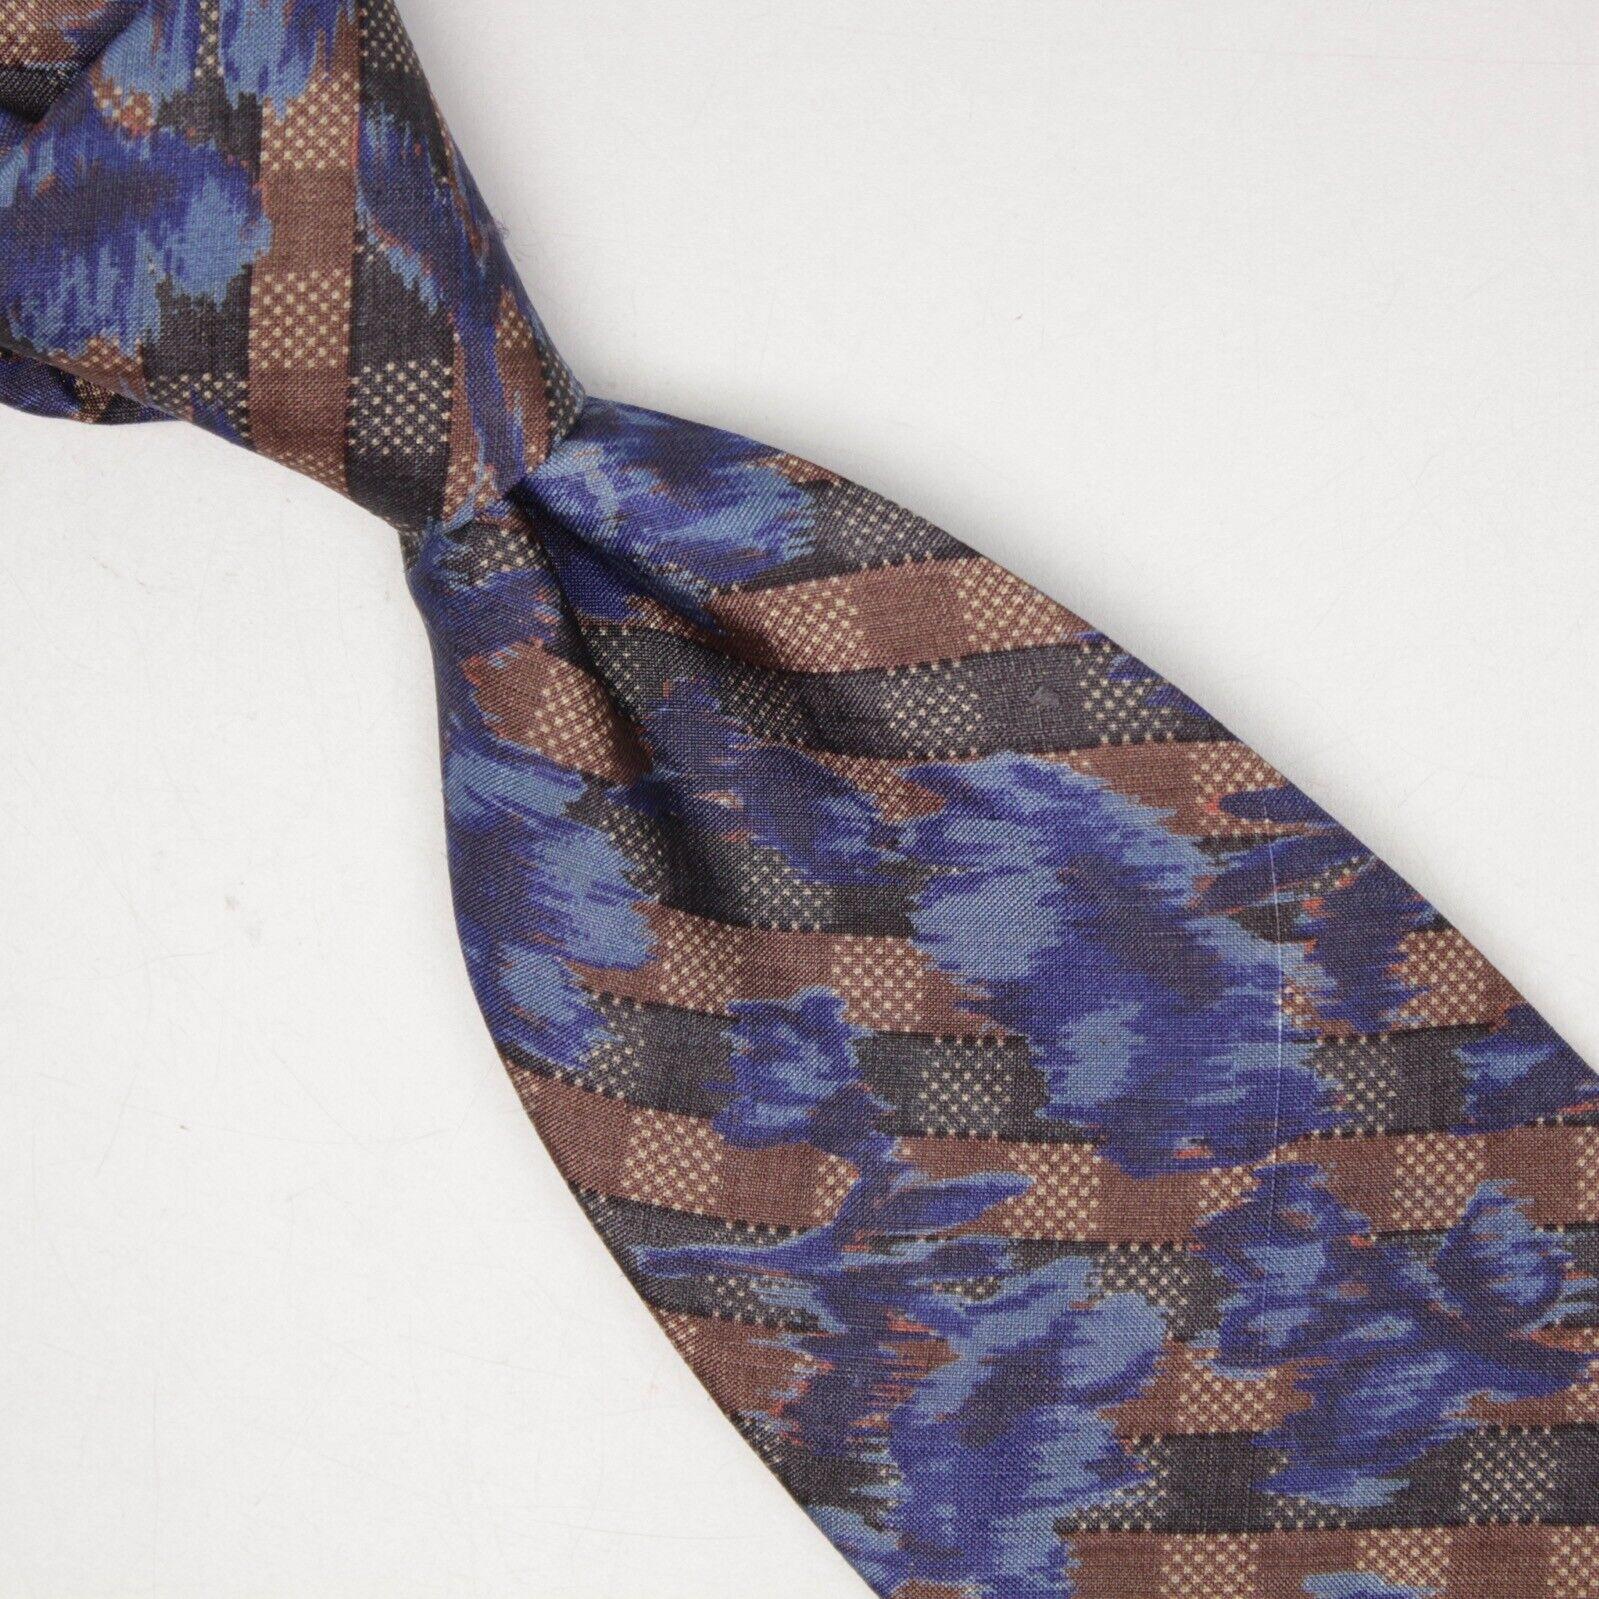 Cerruti 1881 Herren Seide Krawatte Blau Braune Abstrakt Kariert Bedruckt Made IN